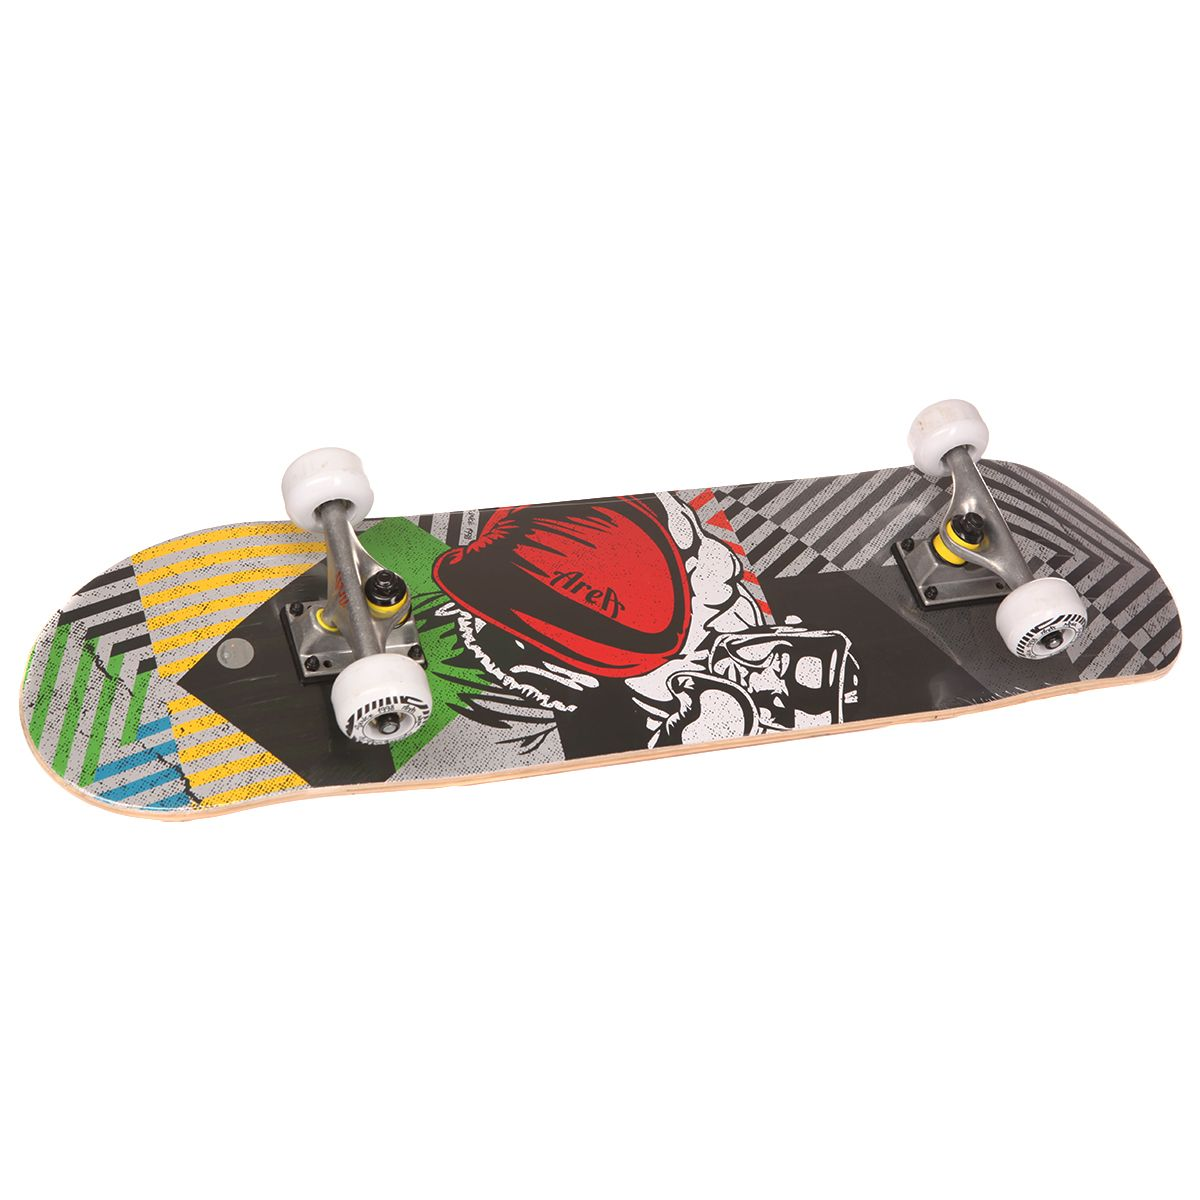 Скейтборд Fun4u